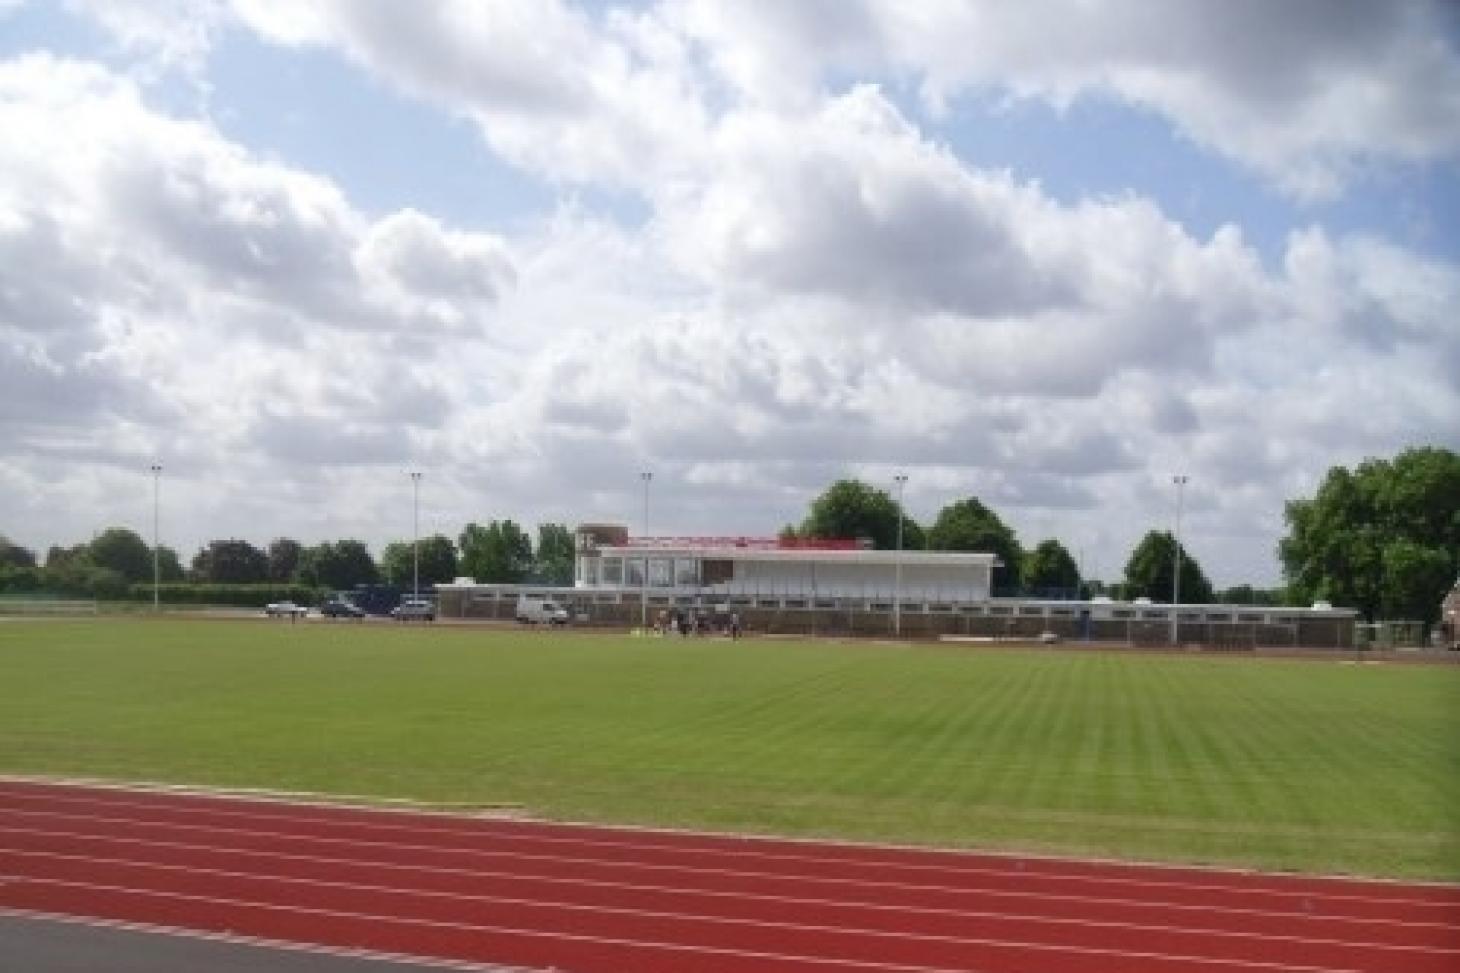 Queen Elizabeth Stadium Enfield 11 a side | Grass football pitch